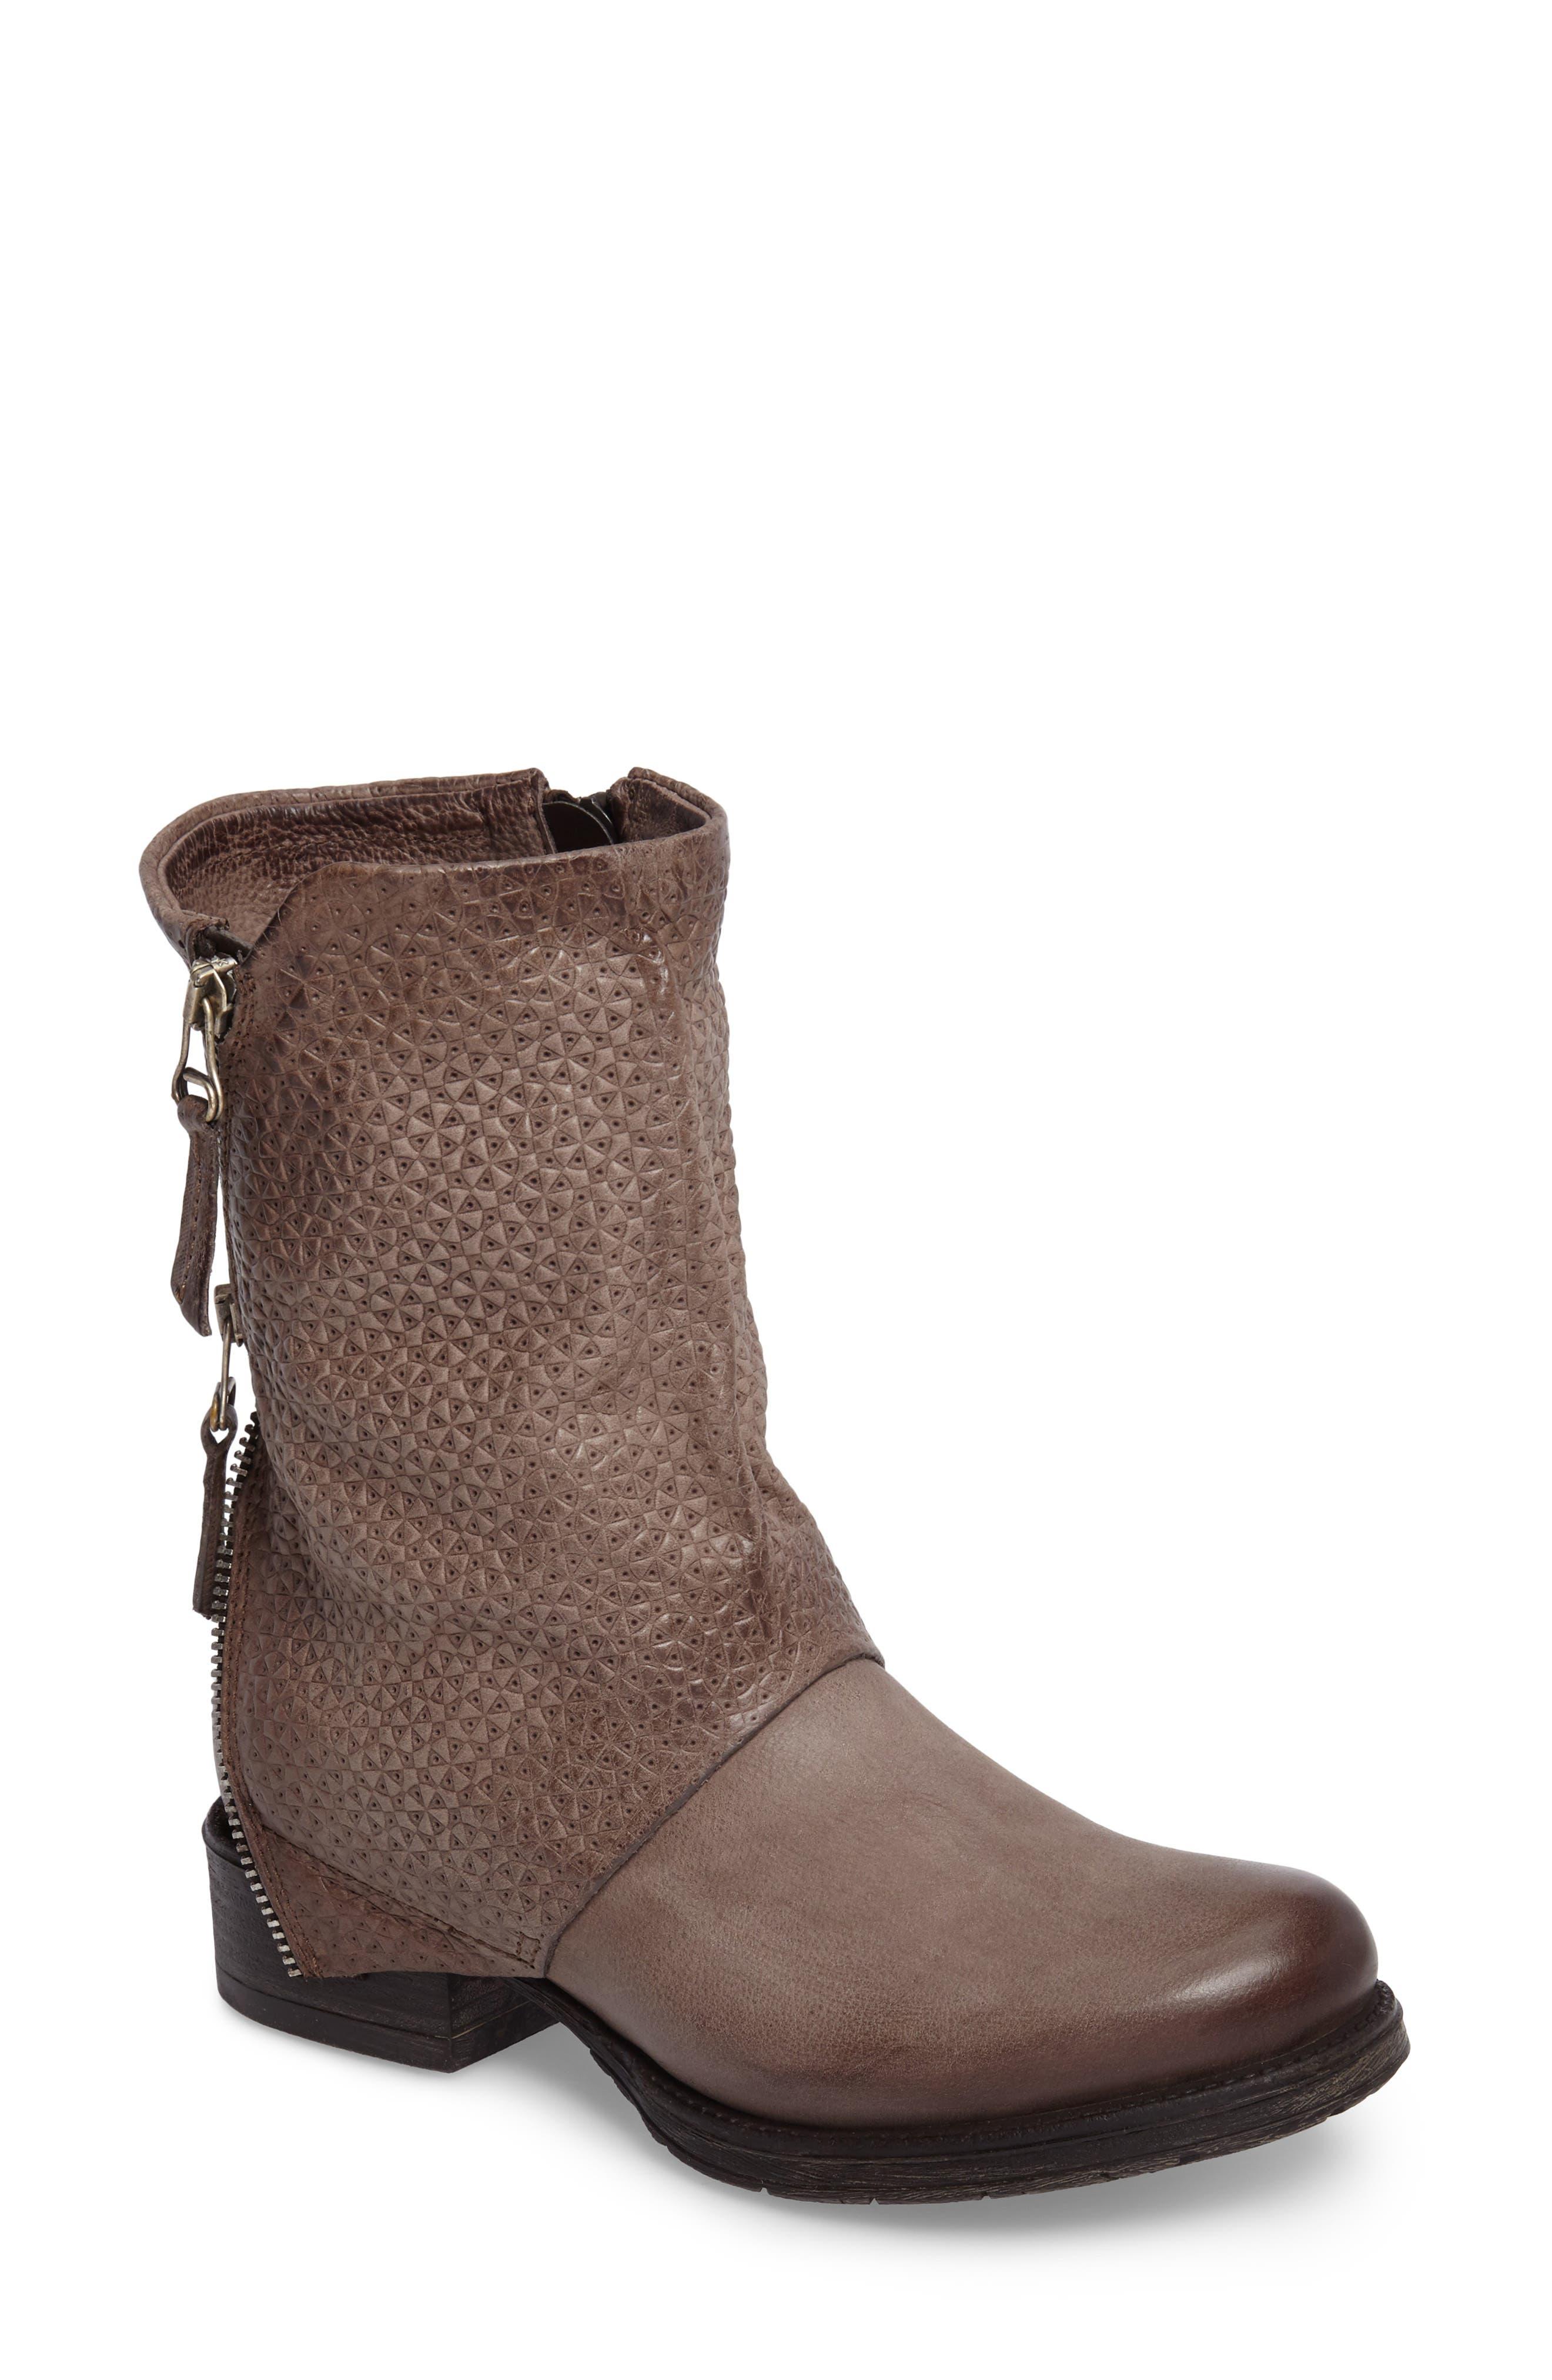 Nugget Asymmetrical Textured Boot,                             Main thumbnail 1, color,                             Ash